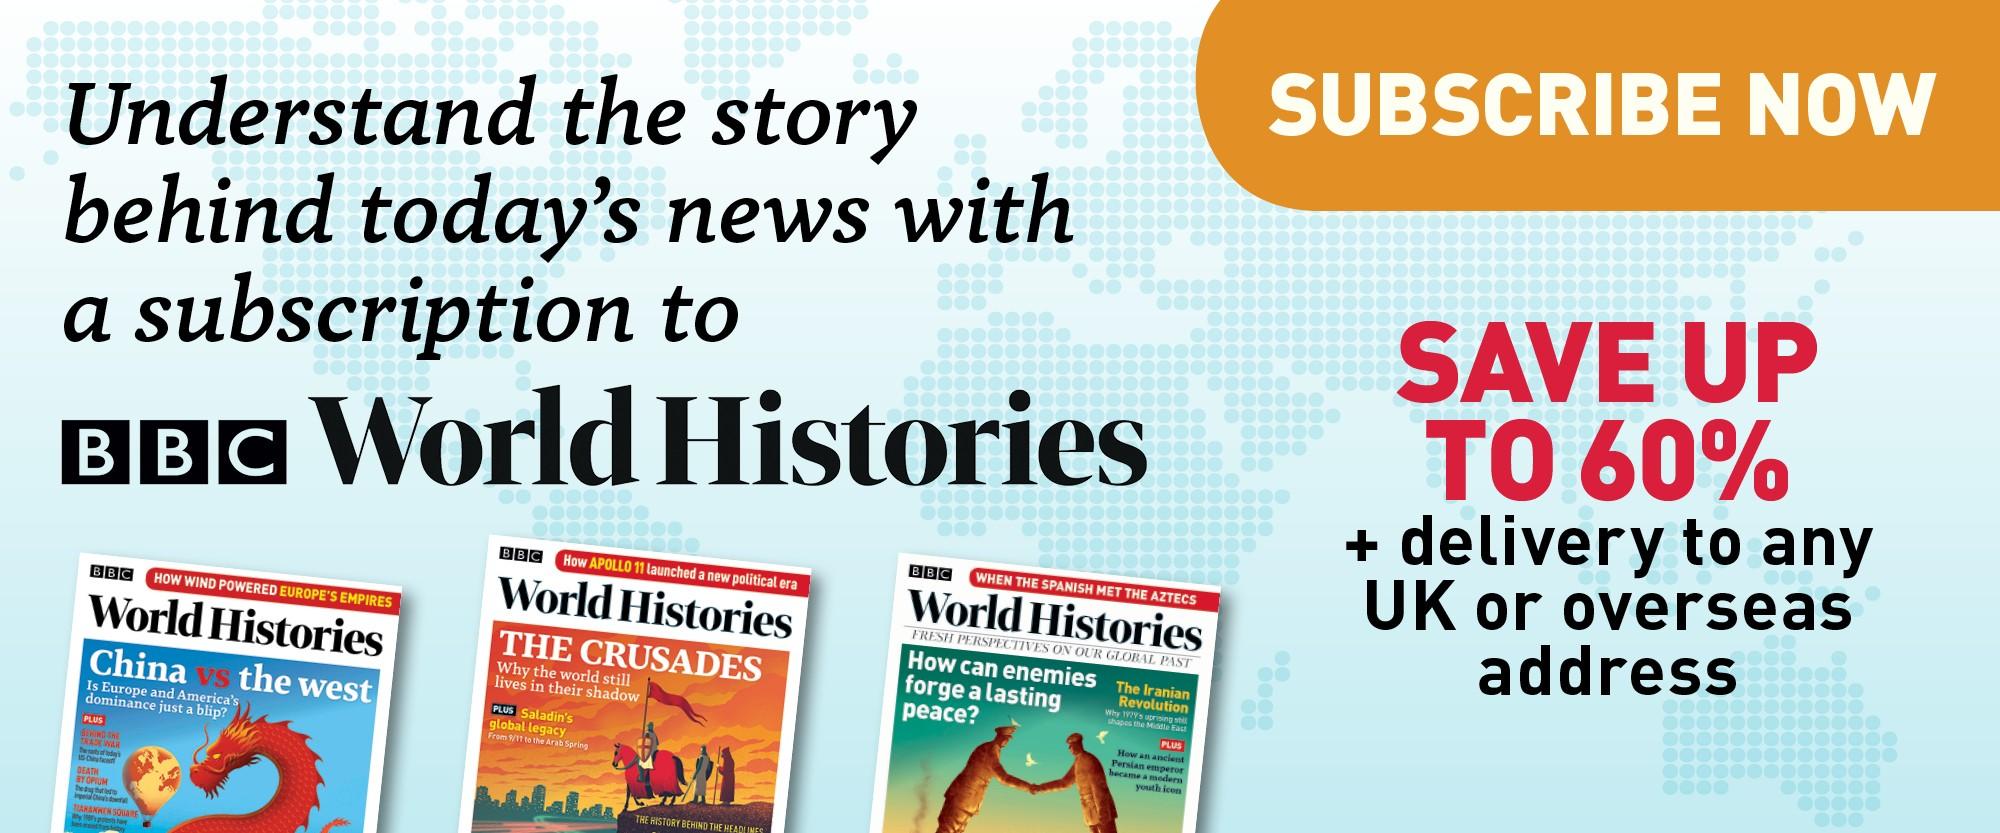 Explore BBC World Histories Magazine - HistoryExtra